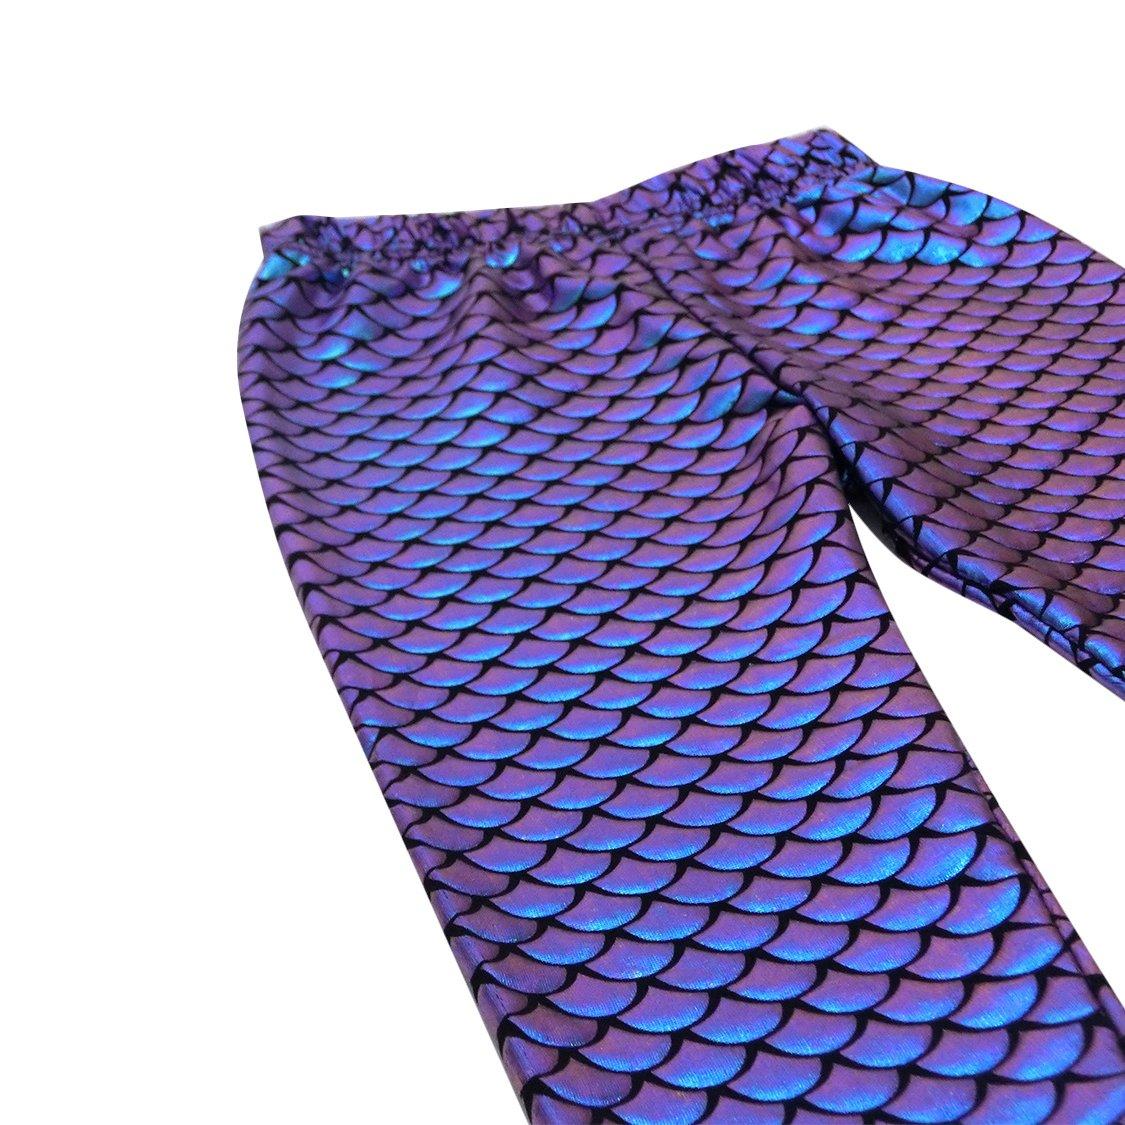 VIEWIM Toddler Baby Girls Clothes Mermaid Fish Stretch Long Leggings Pants 1-5 Years by VIEWIM (Image #2)